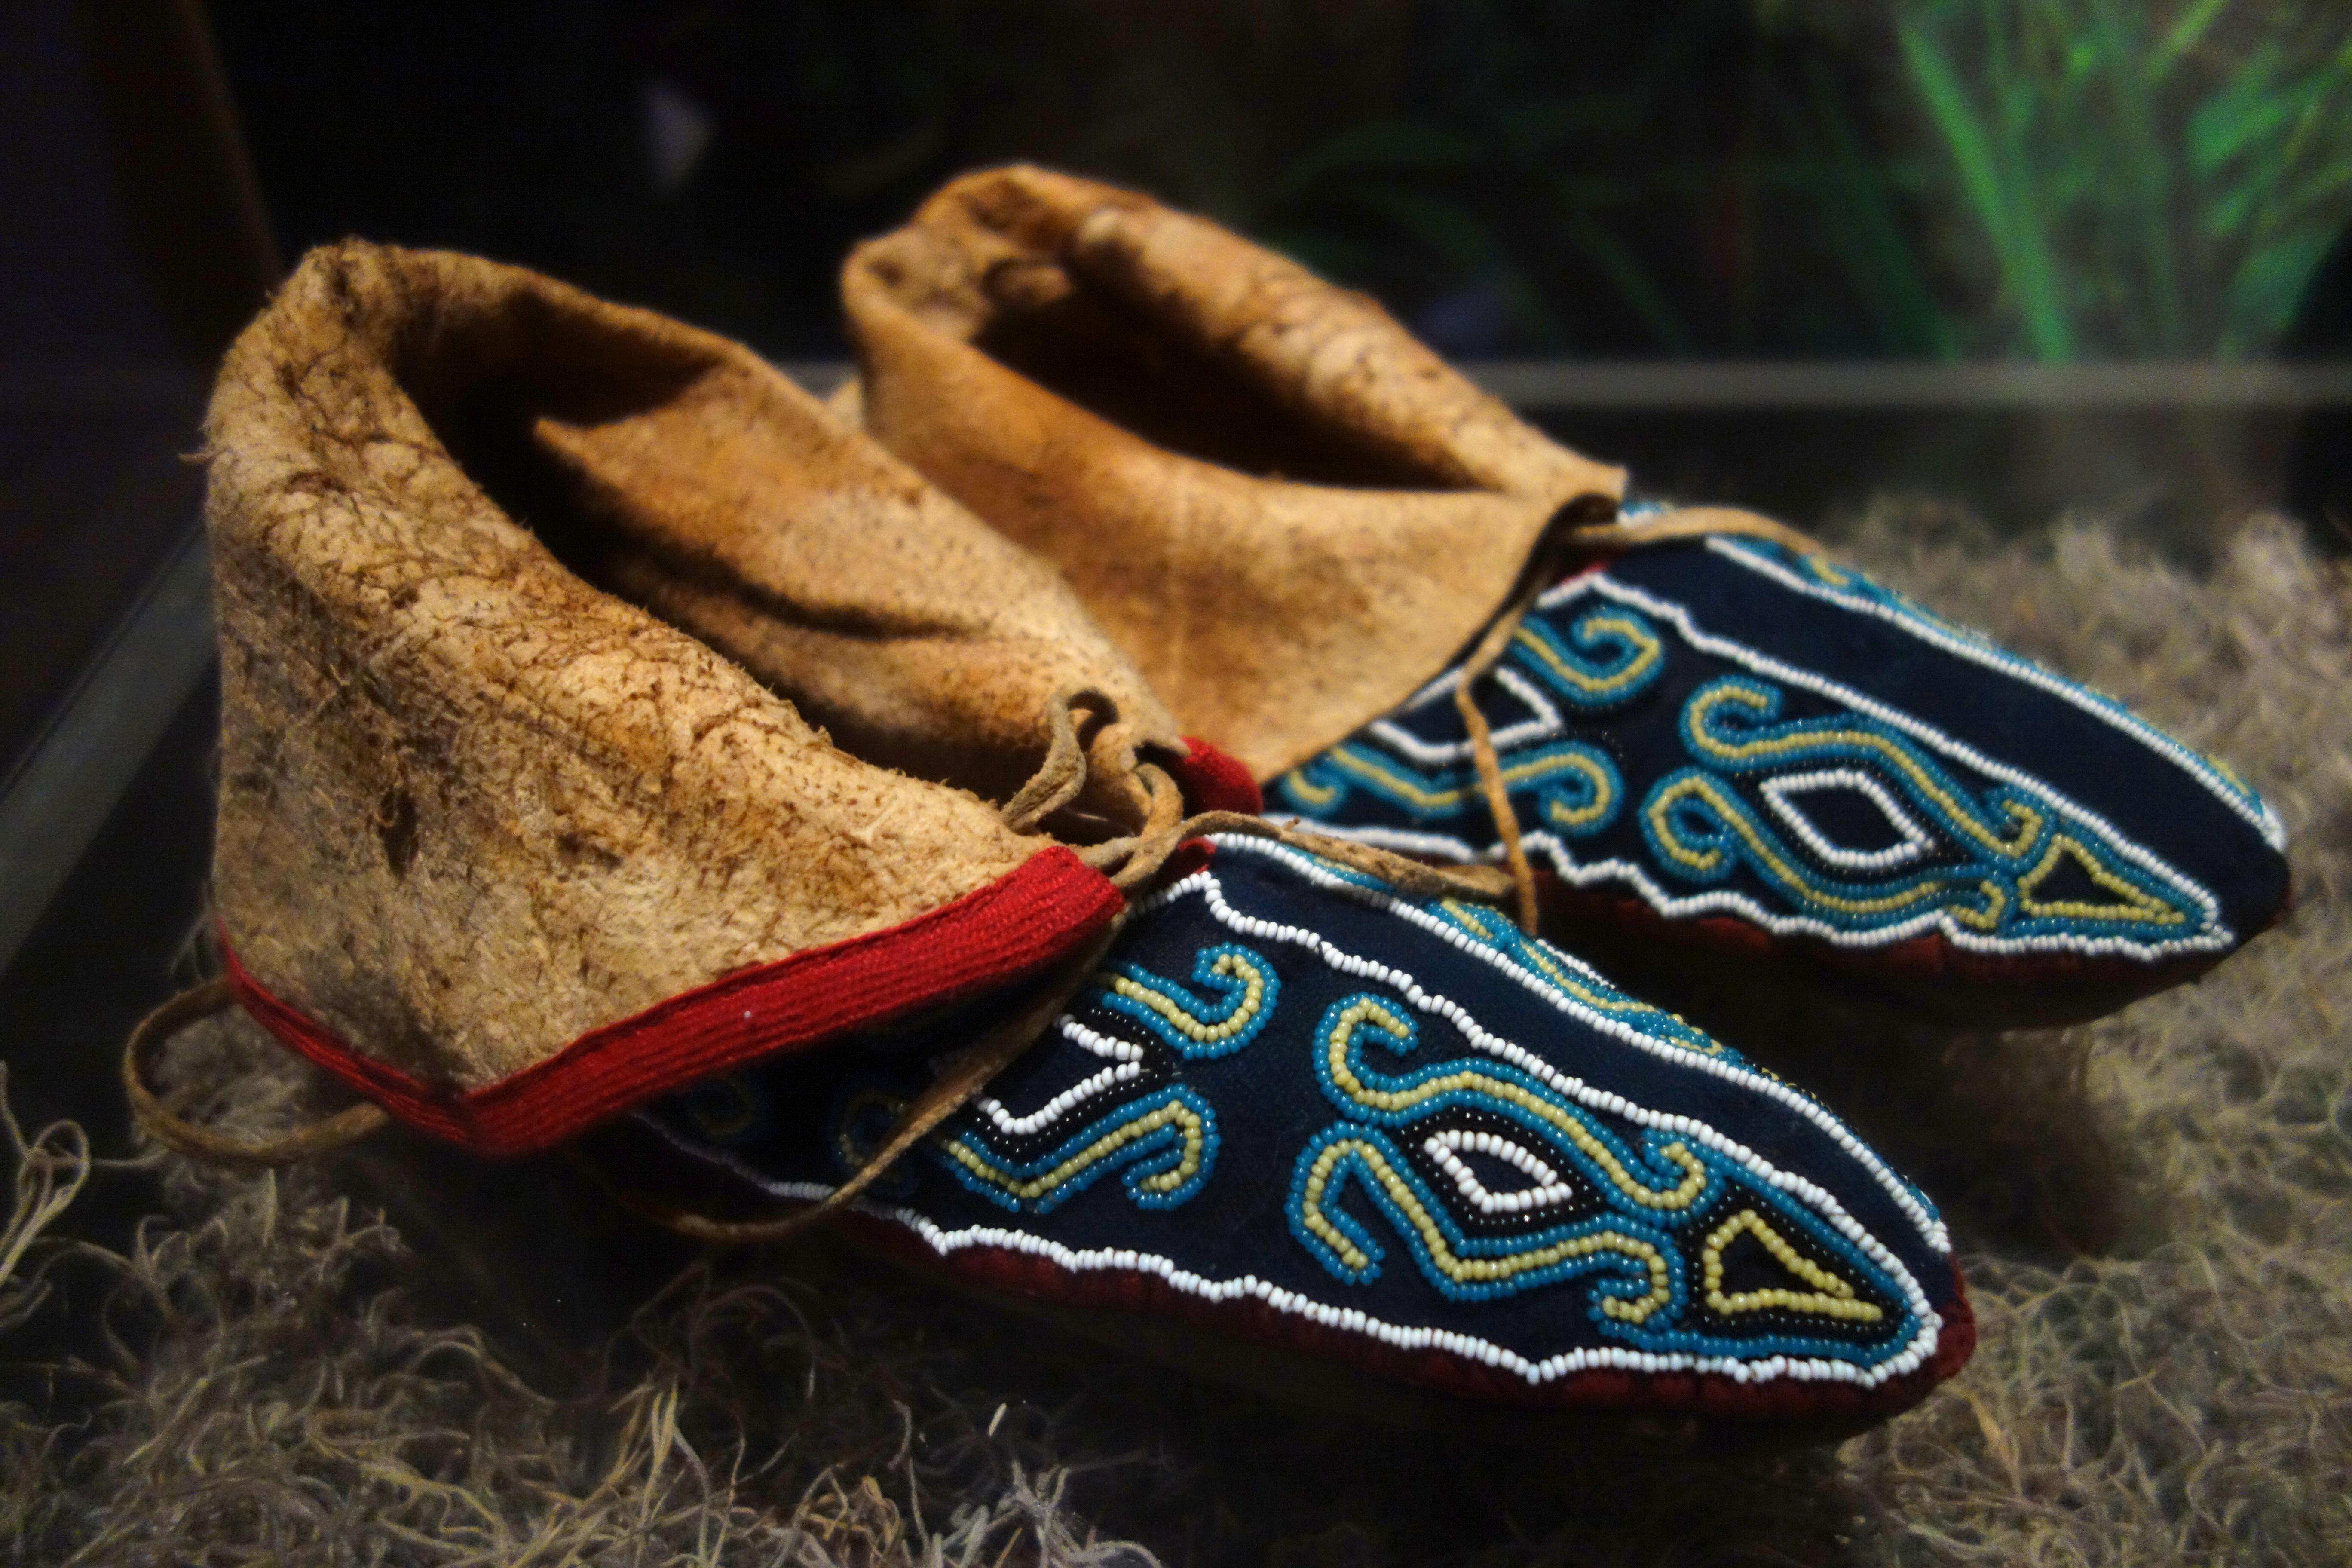 FSU Seminole Apparel | Men's Shoes & Socks - Men's Accessories - Men's